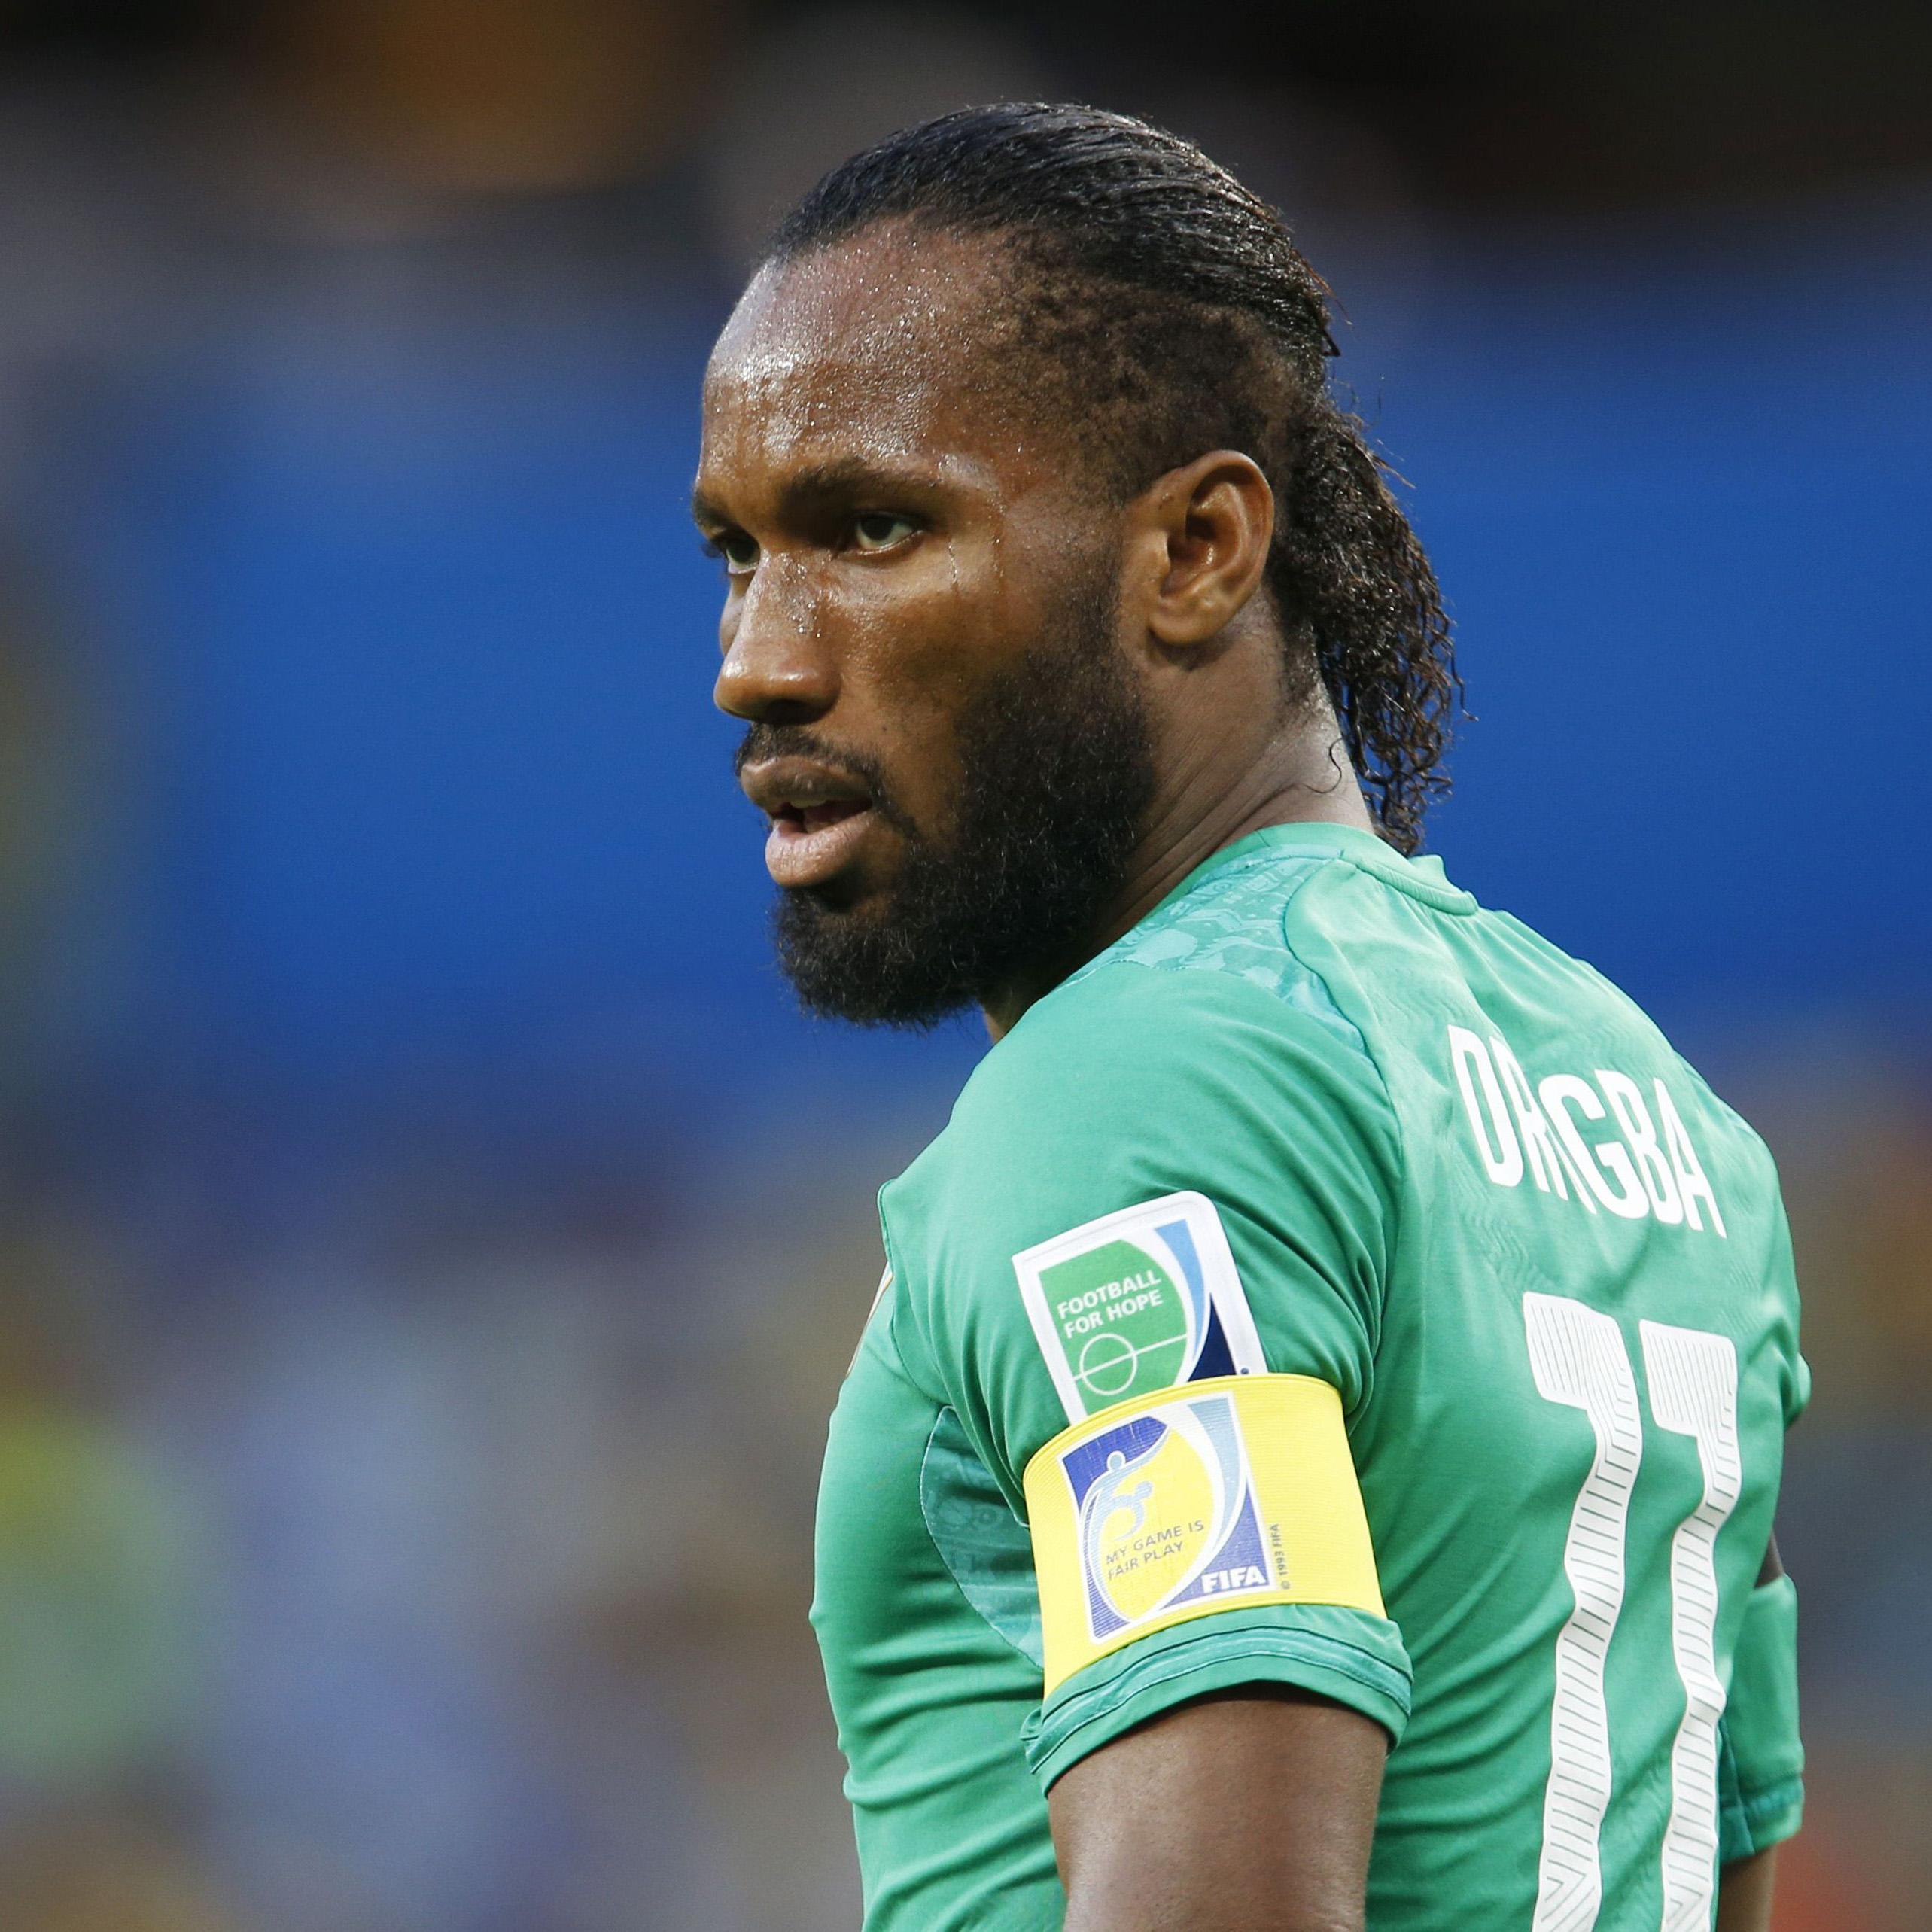 Ivory Coast's Didier Drogba